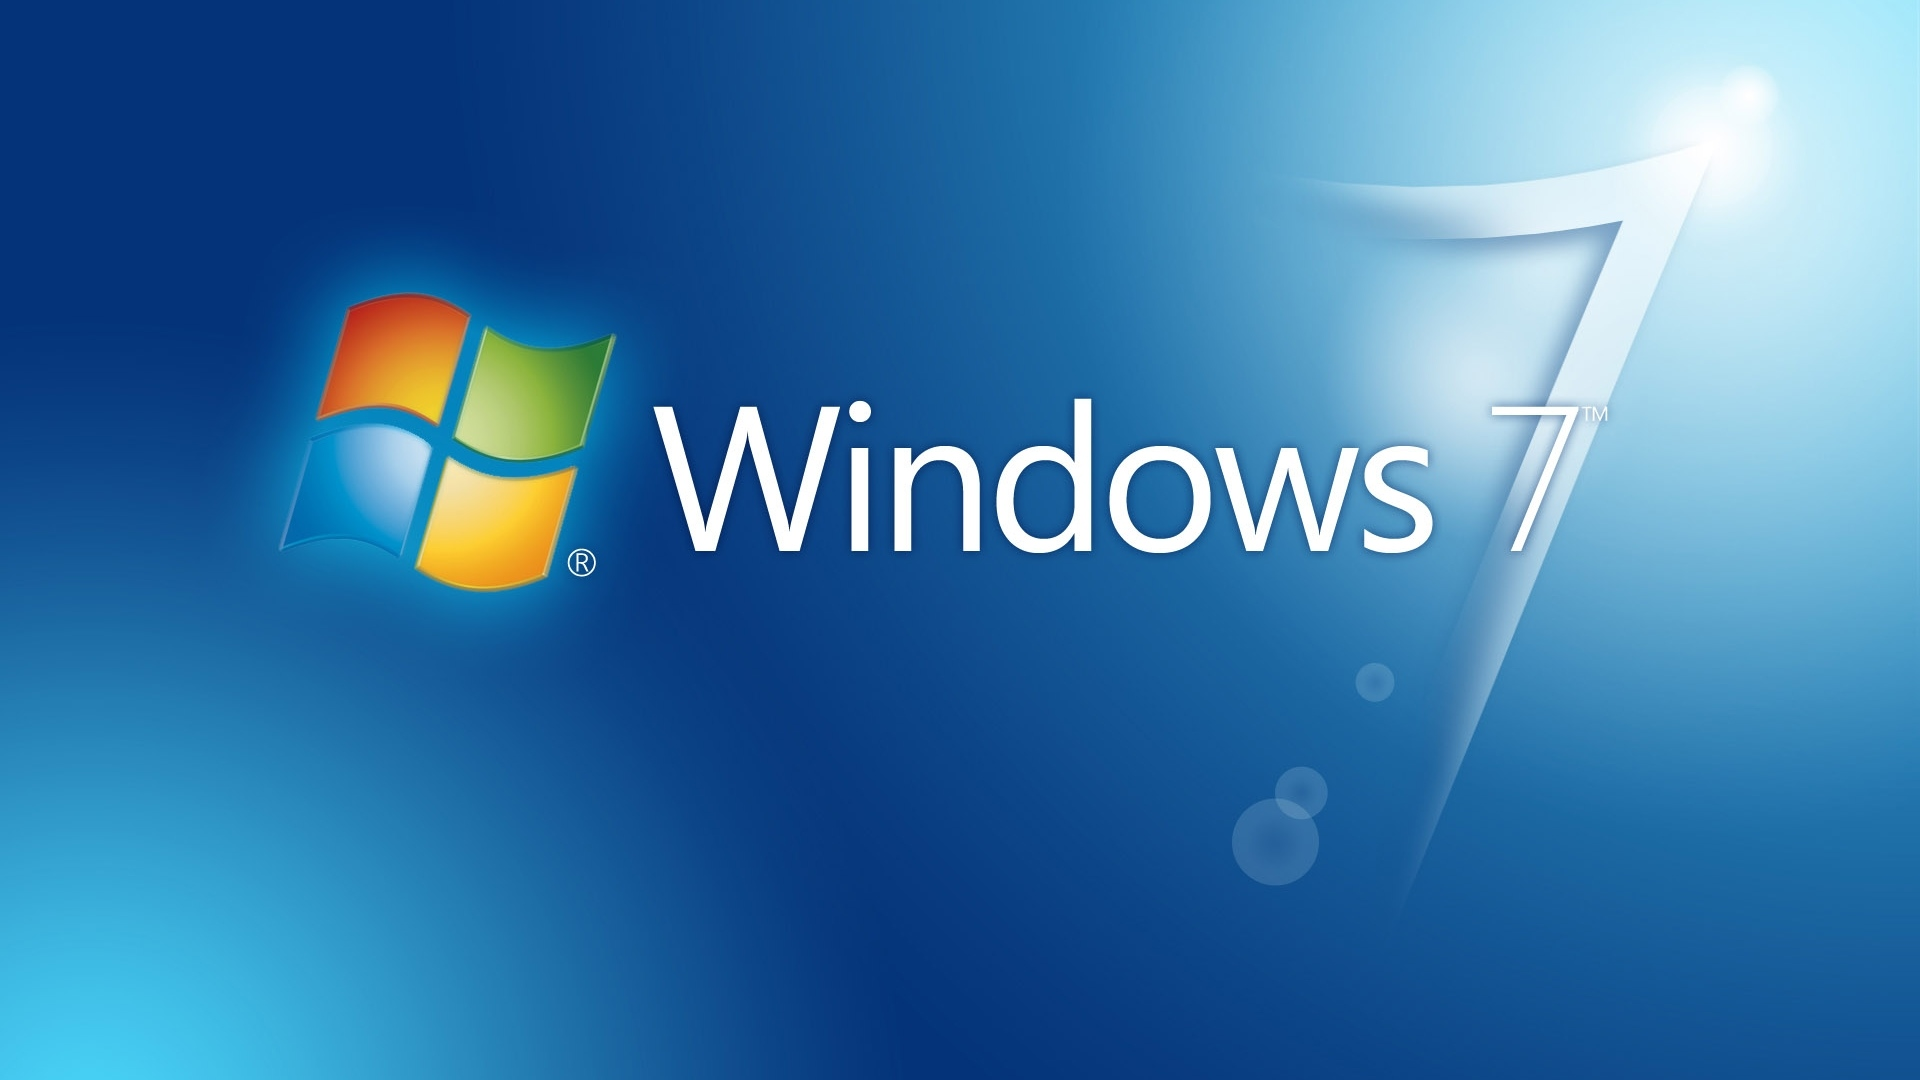 Windows 7 desktop backgrounds   SF Wallpaper 1920x1080